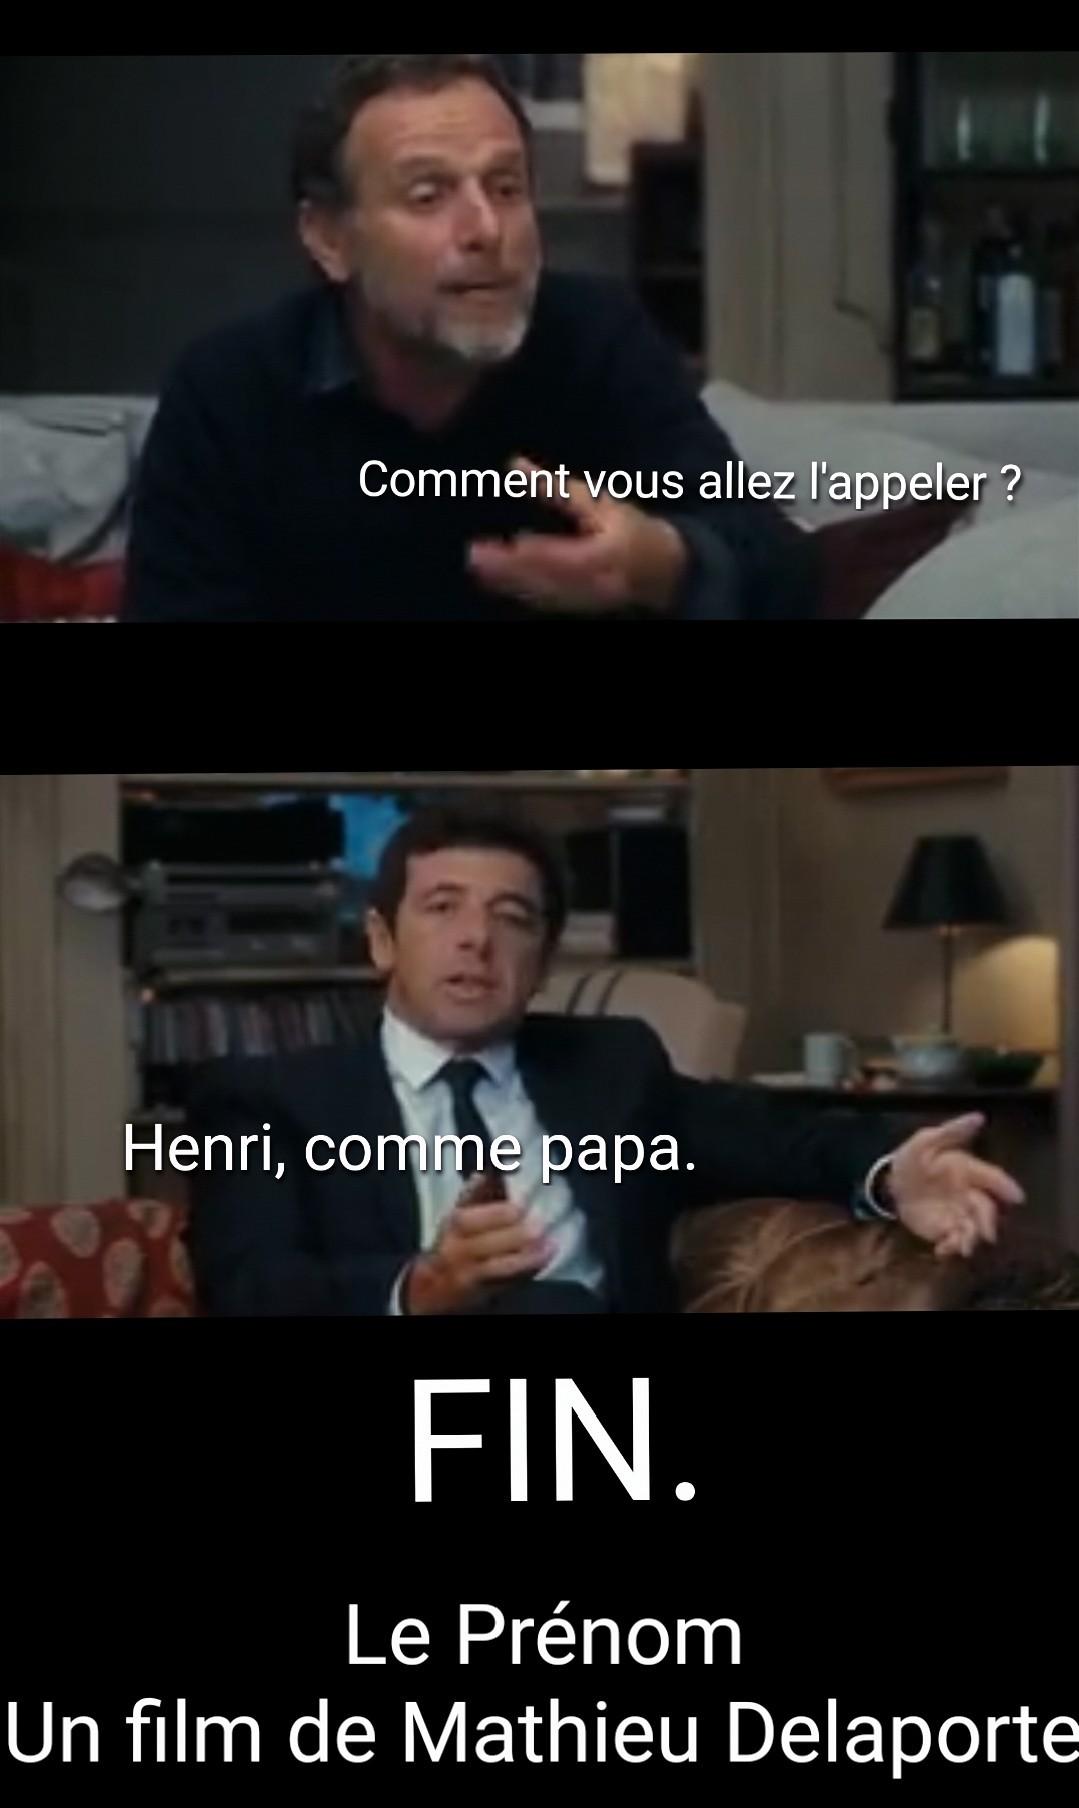 Le Prénom - Fin alternative - meme